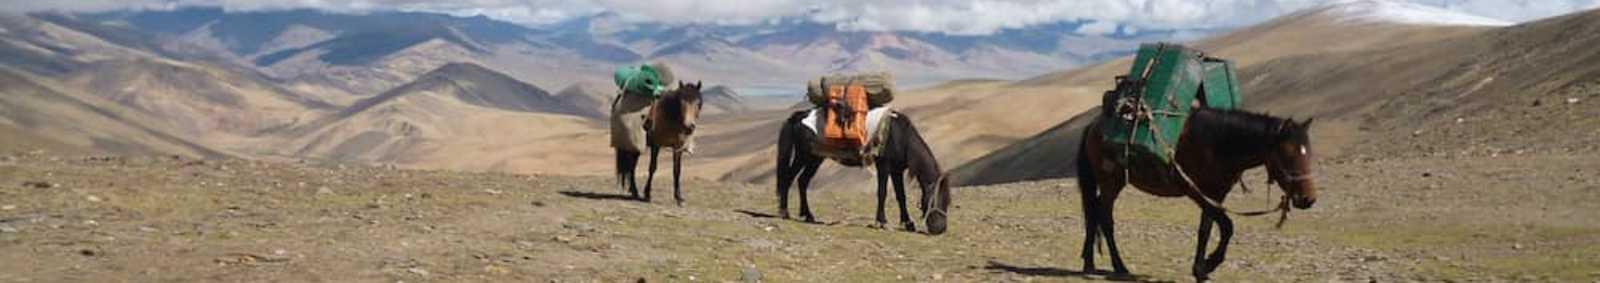 Ladakhi Himalaya